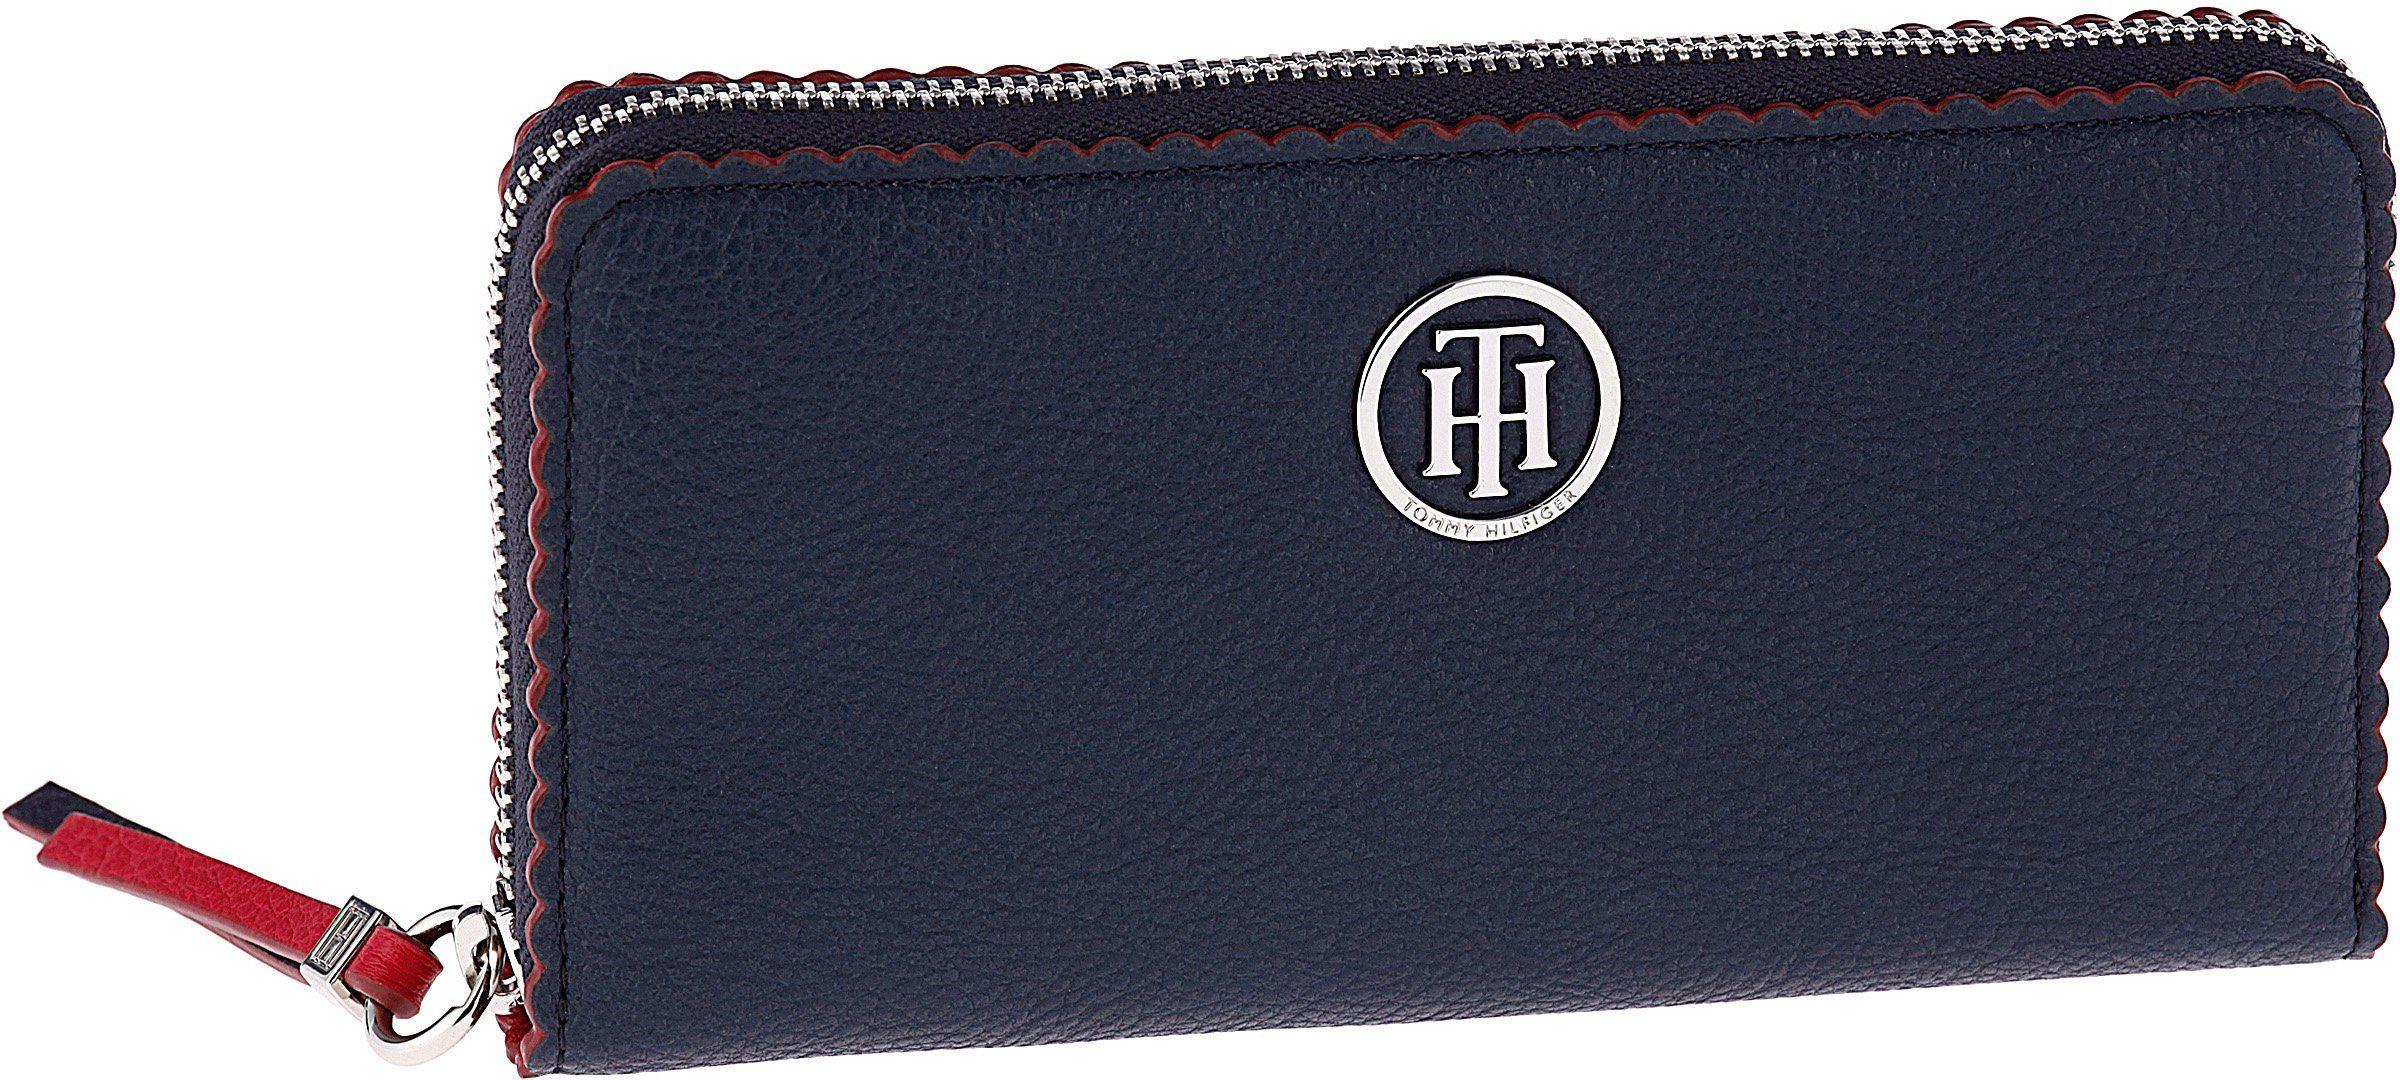 Tommy Hilfiger Geldbörse »Fashion Novelty Large Wallet«